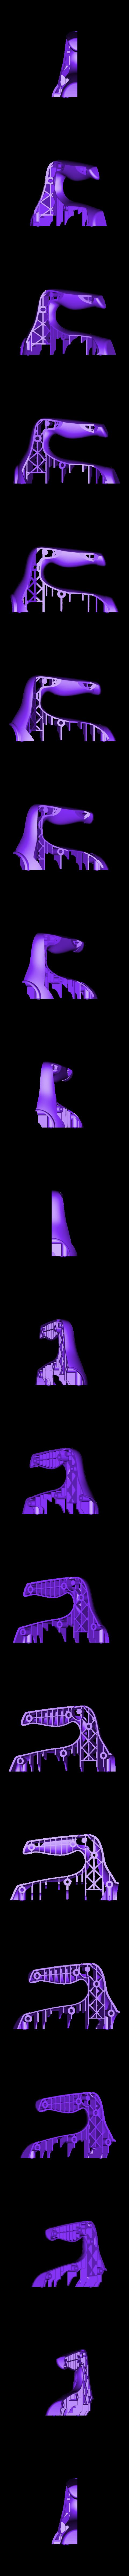 Blender_Right.STL Download free STL file Hand Mixer • 3D printable design, alterboy987